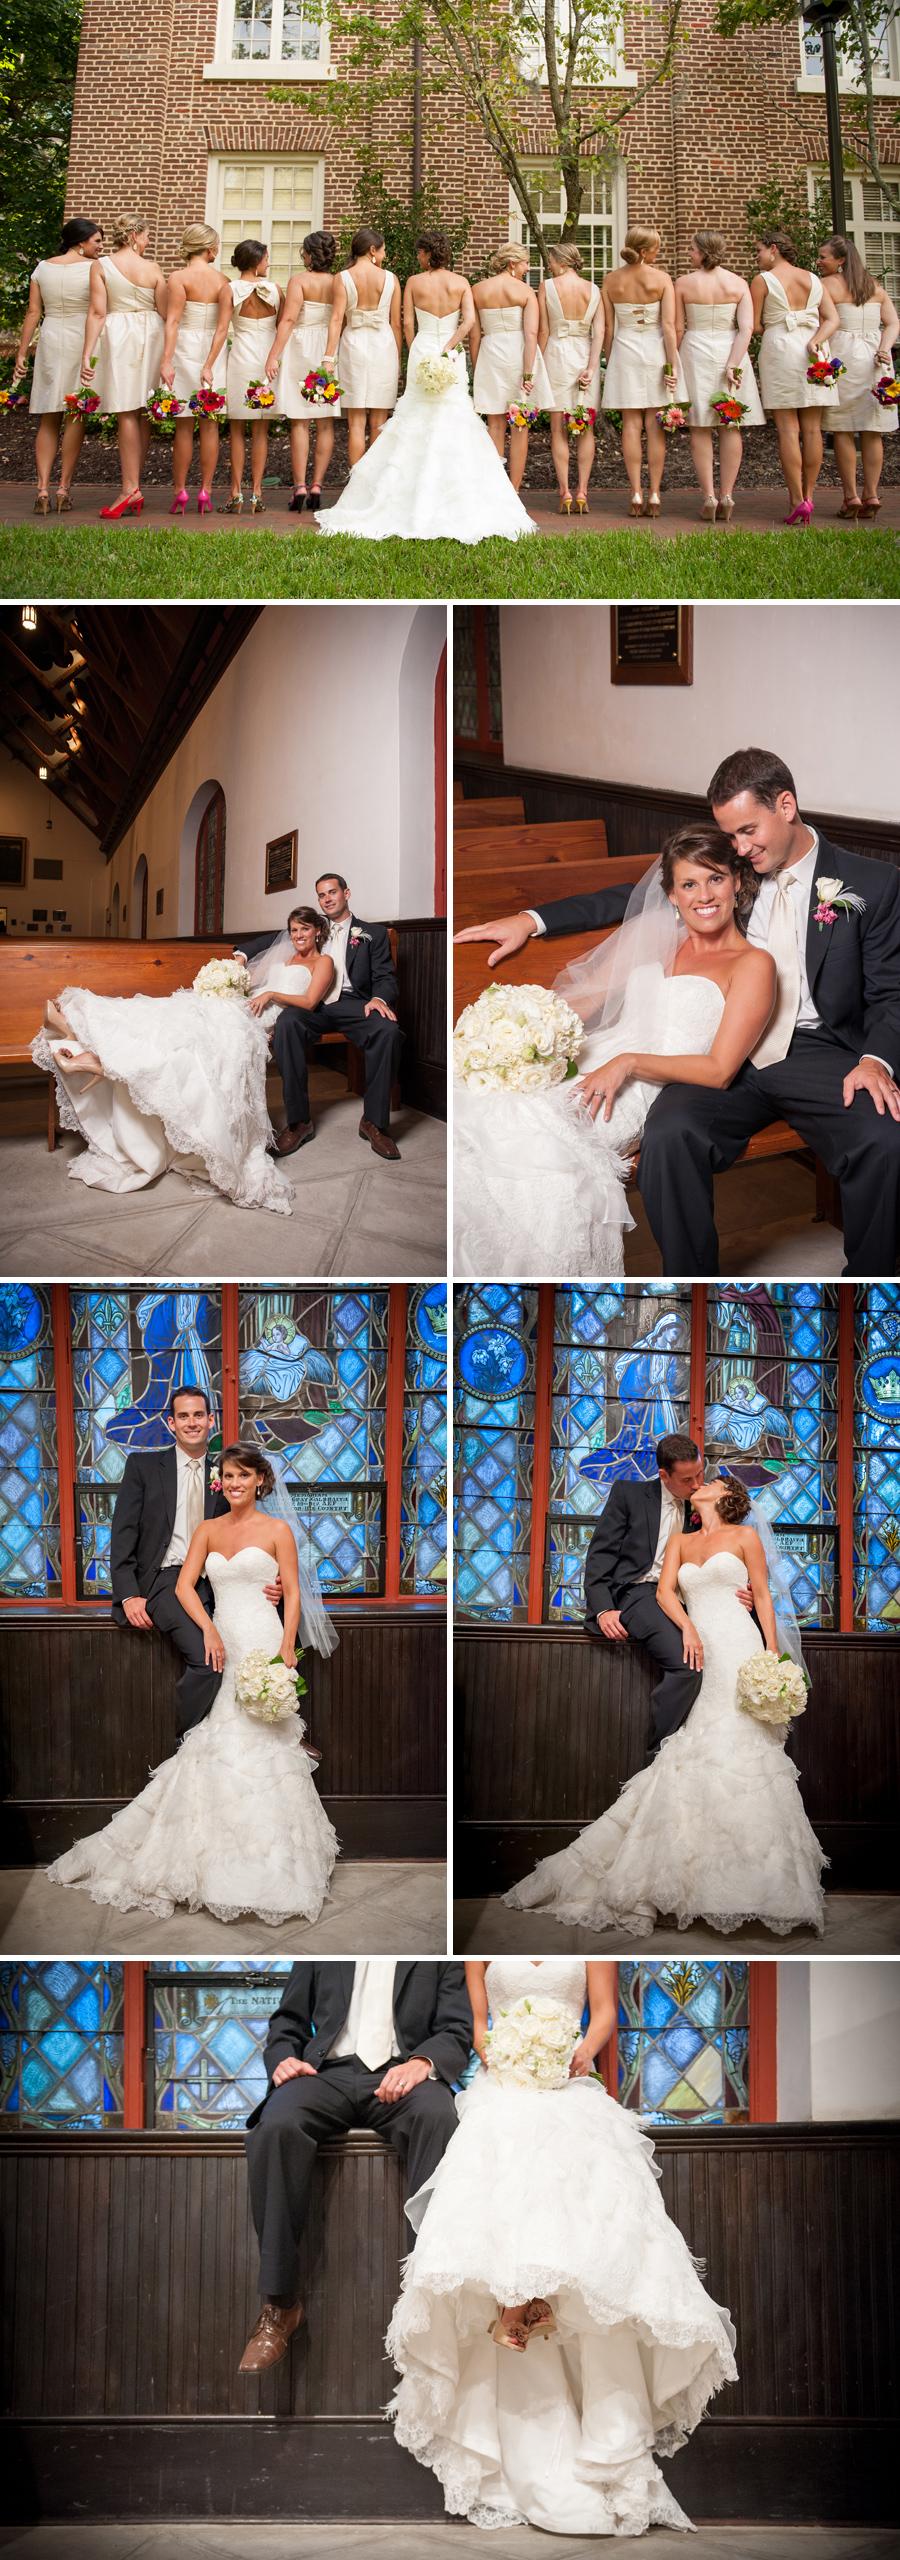 Monica and Adam Wedding at St. Luke's Chapel